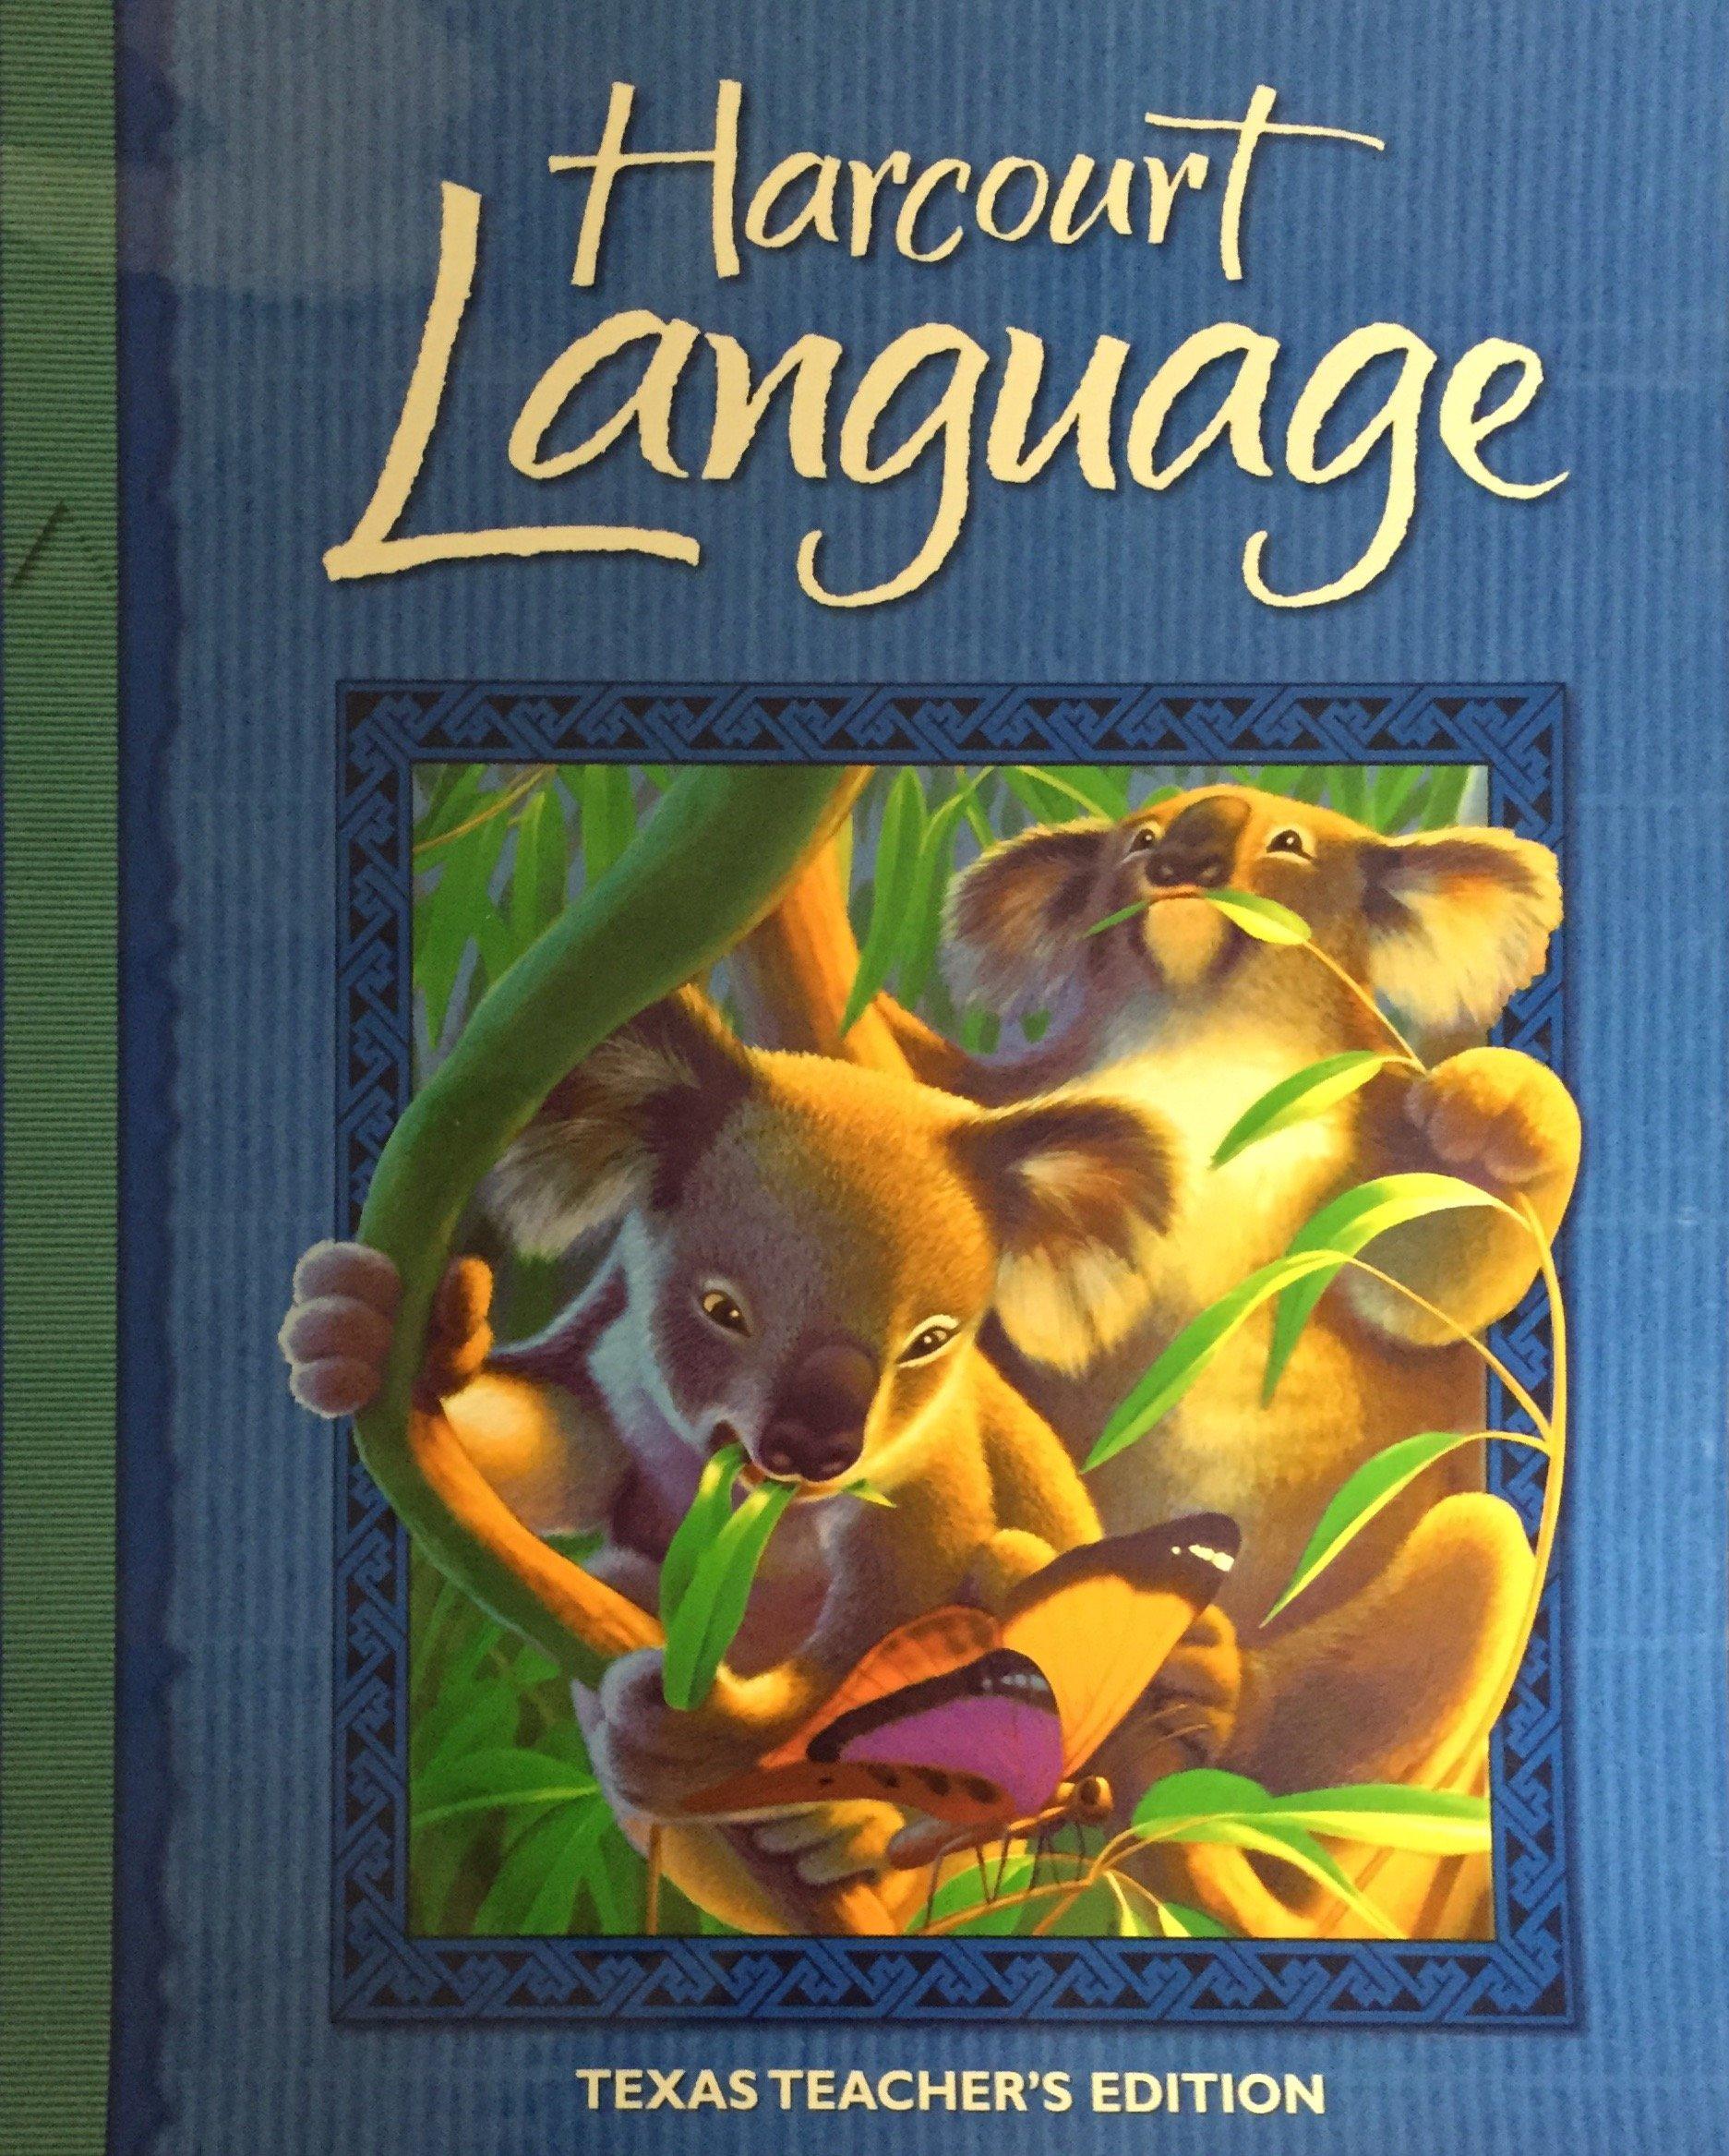 Download Harcourt Language Texas Teacher's Edition Grade 2 (Harcourt Language) ebook